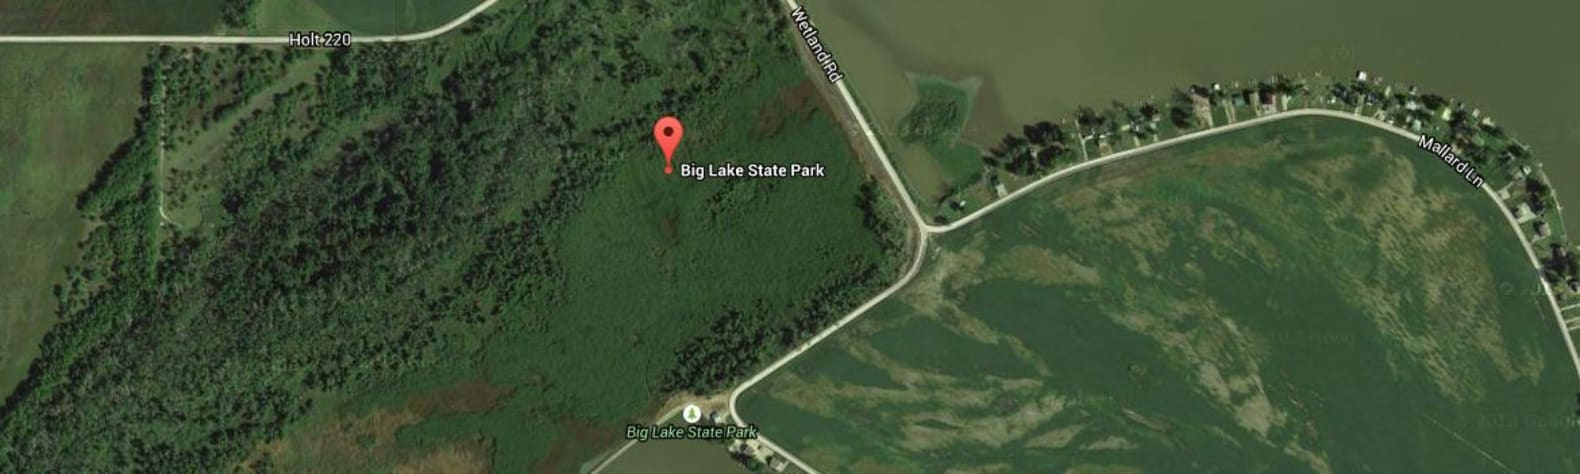 Big Lake State Park